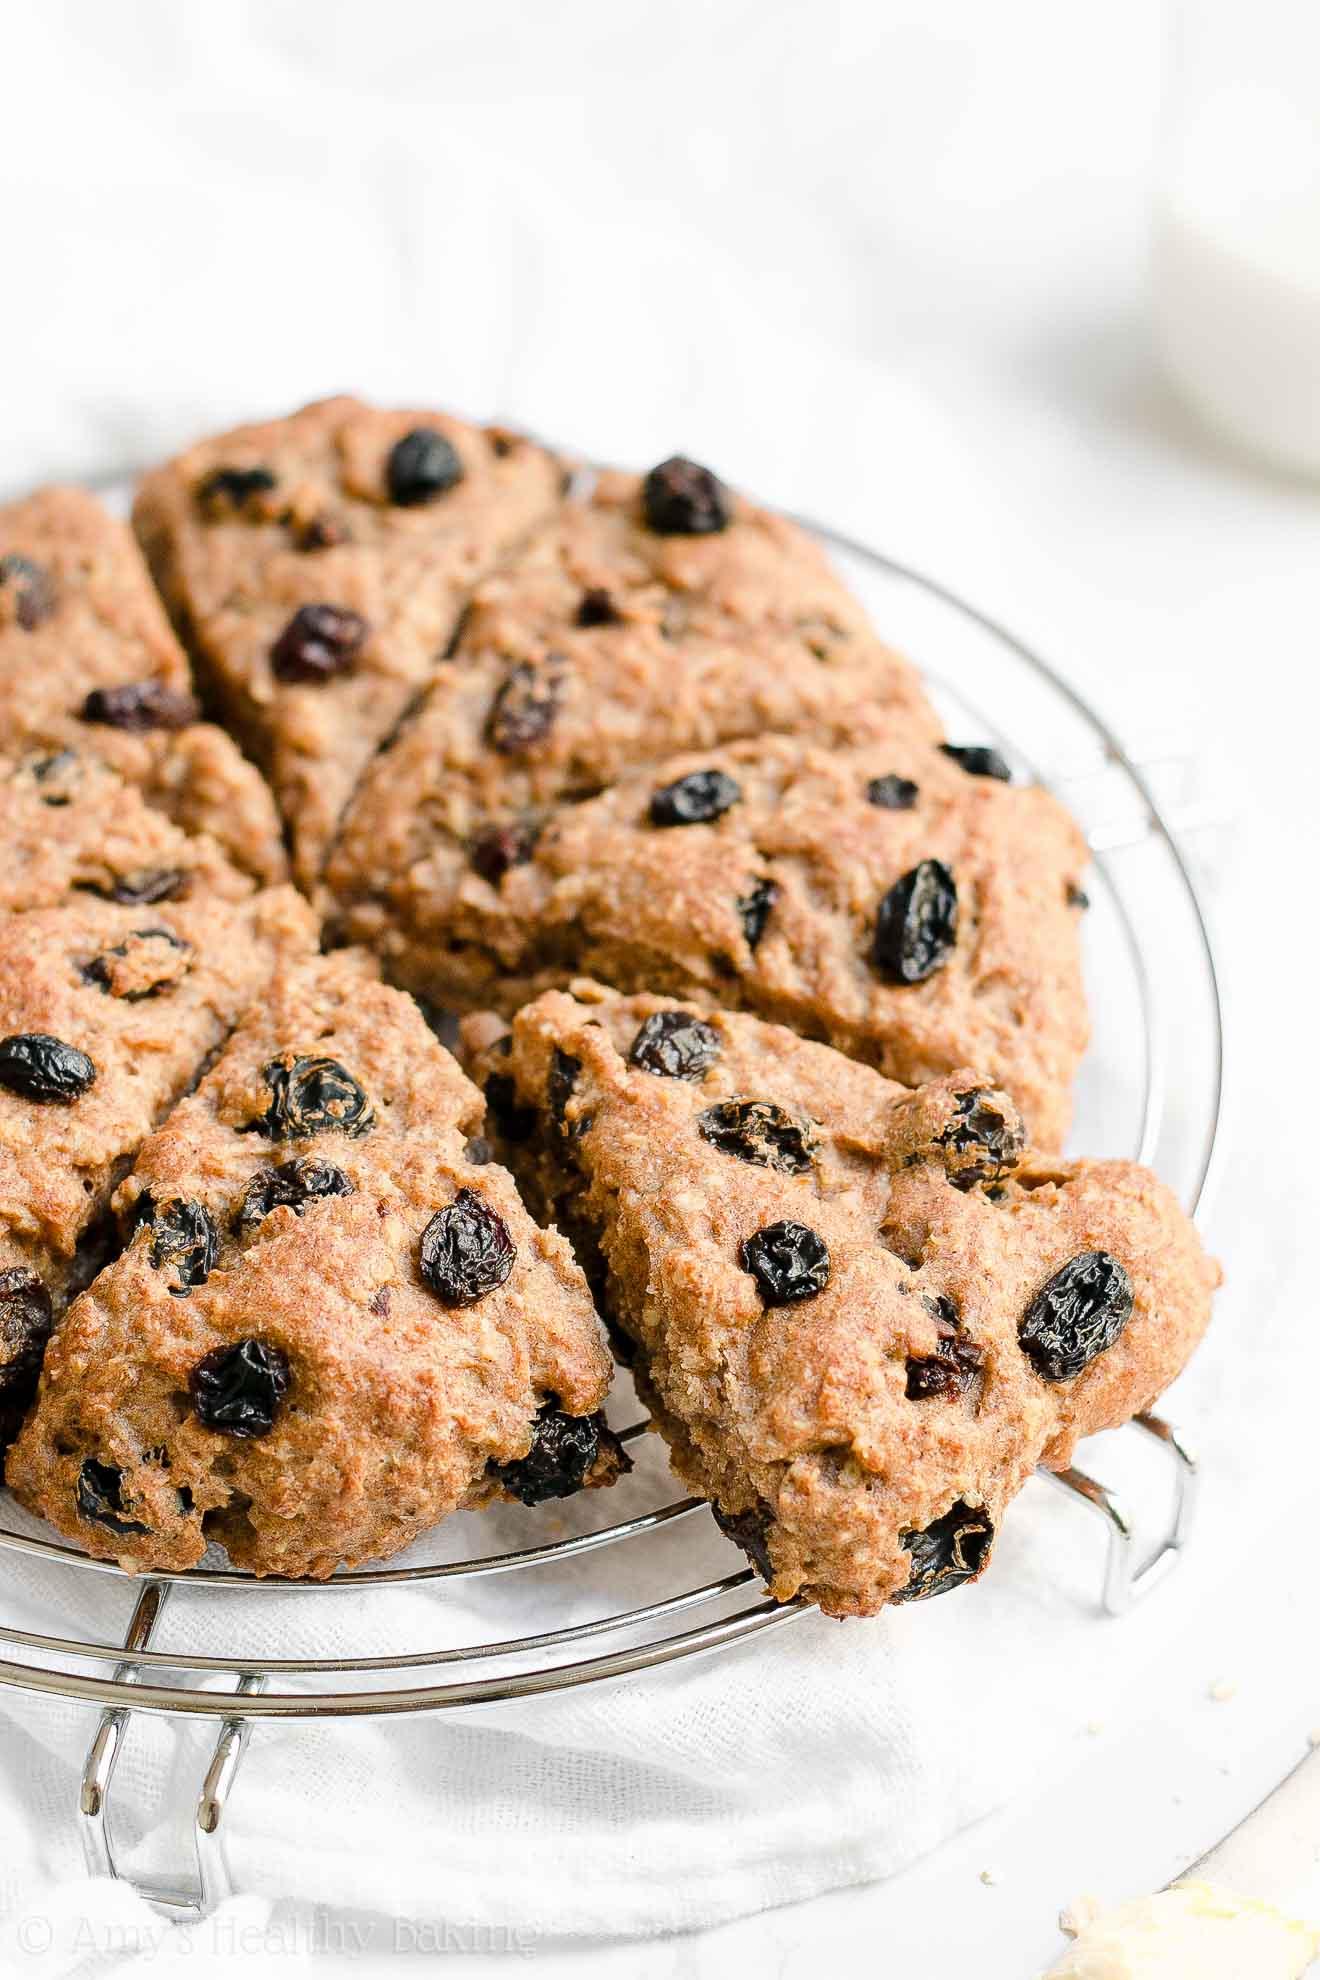 Healthy Low Calorie Gluten Free Oatmeal Raisin Scones